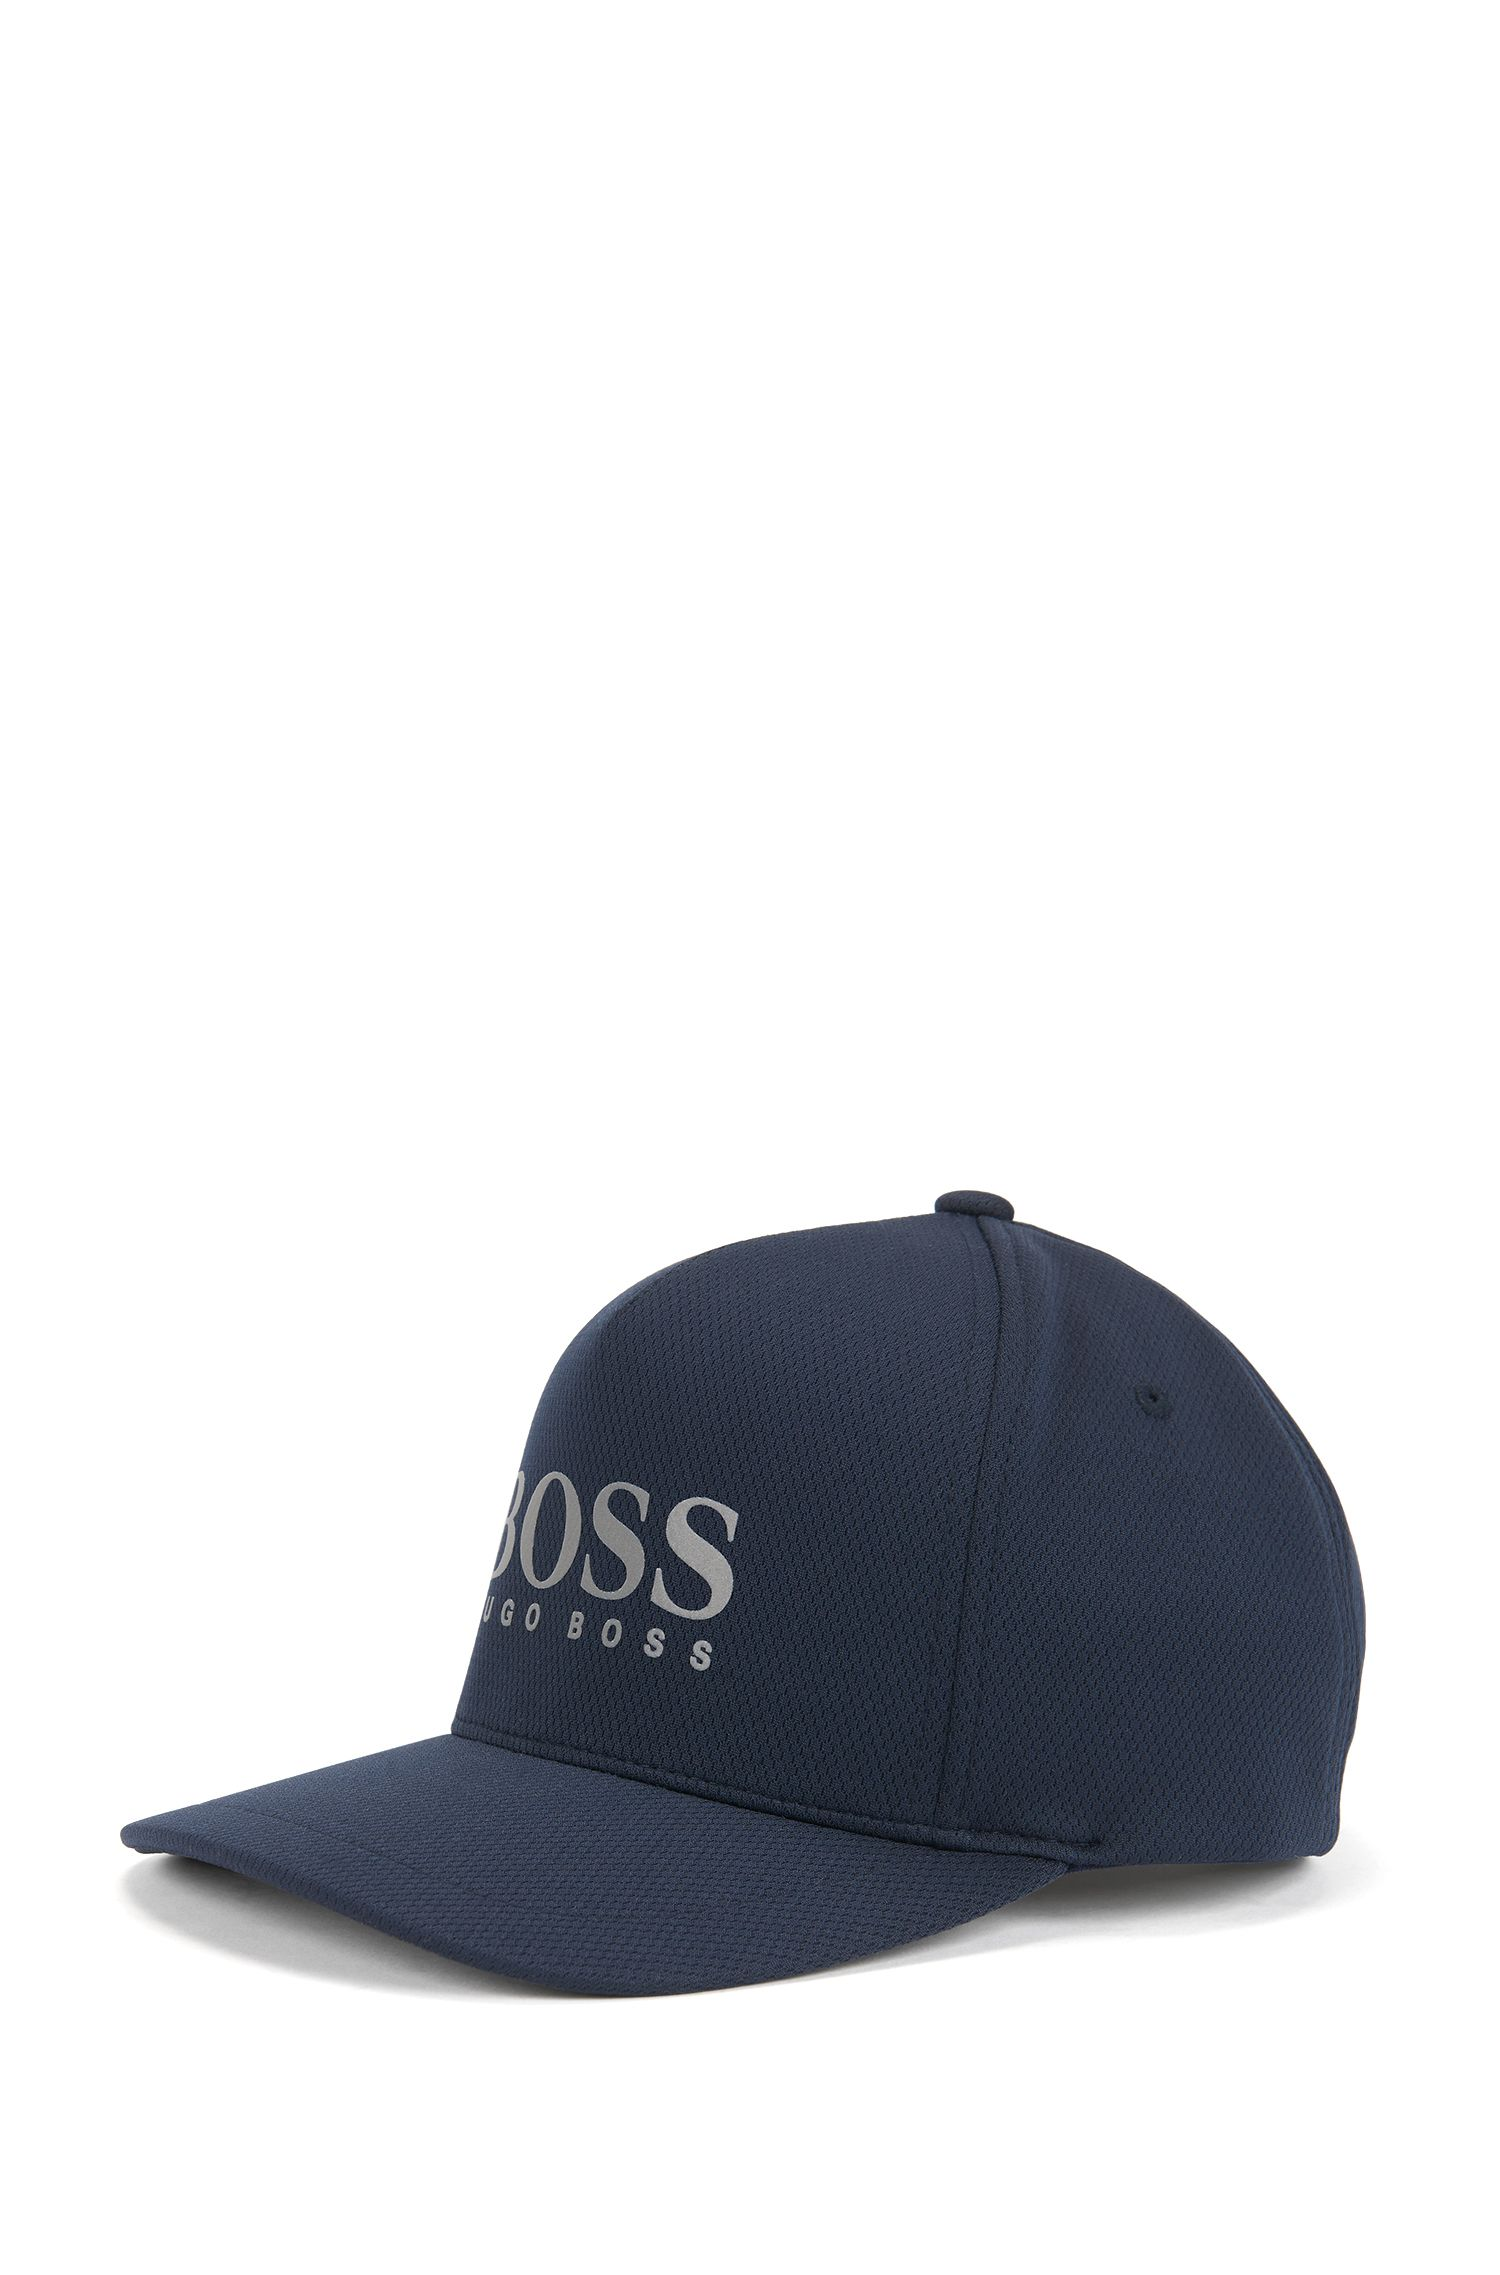 Logo-detail baseball cap in honeycomb jersey